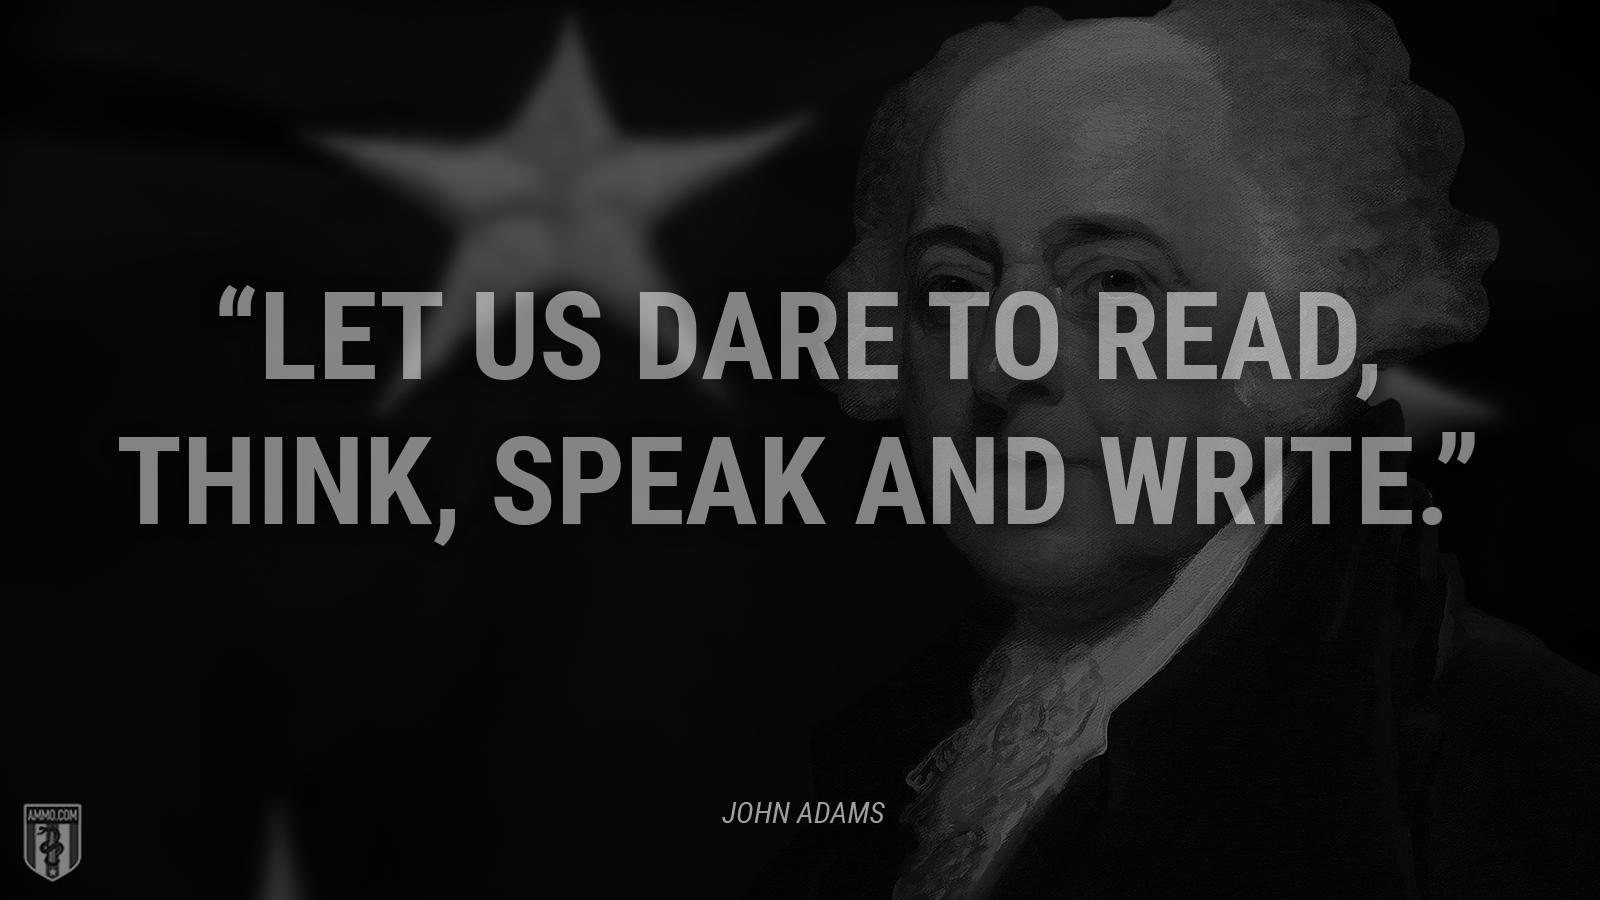 """Let us dare to read, think, speak and write."" - John Adams"